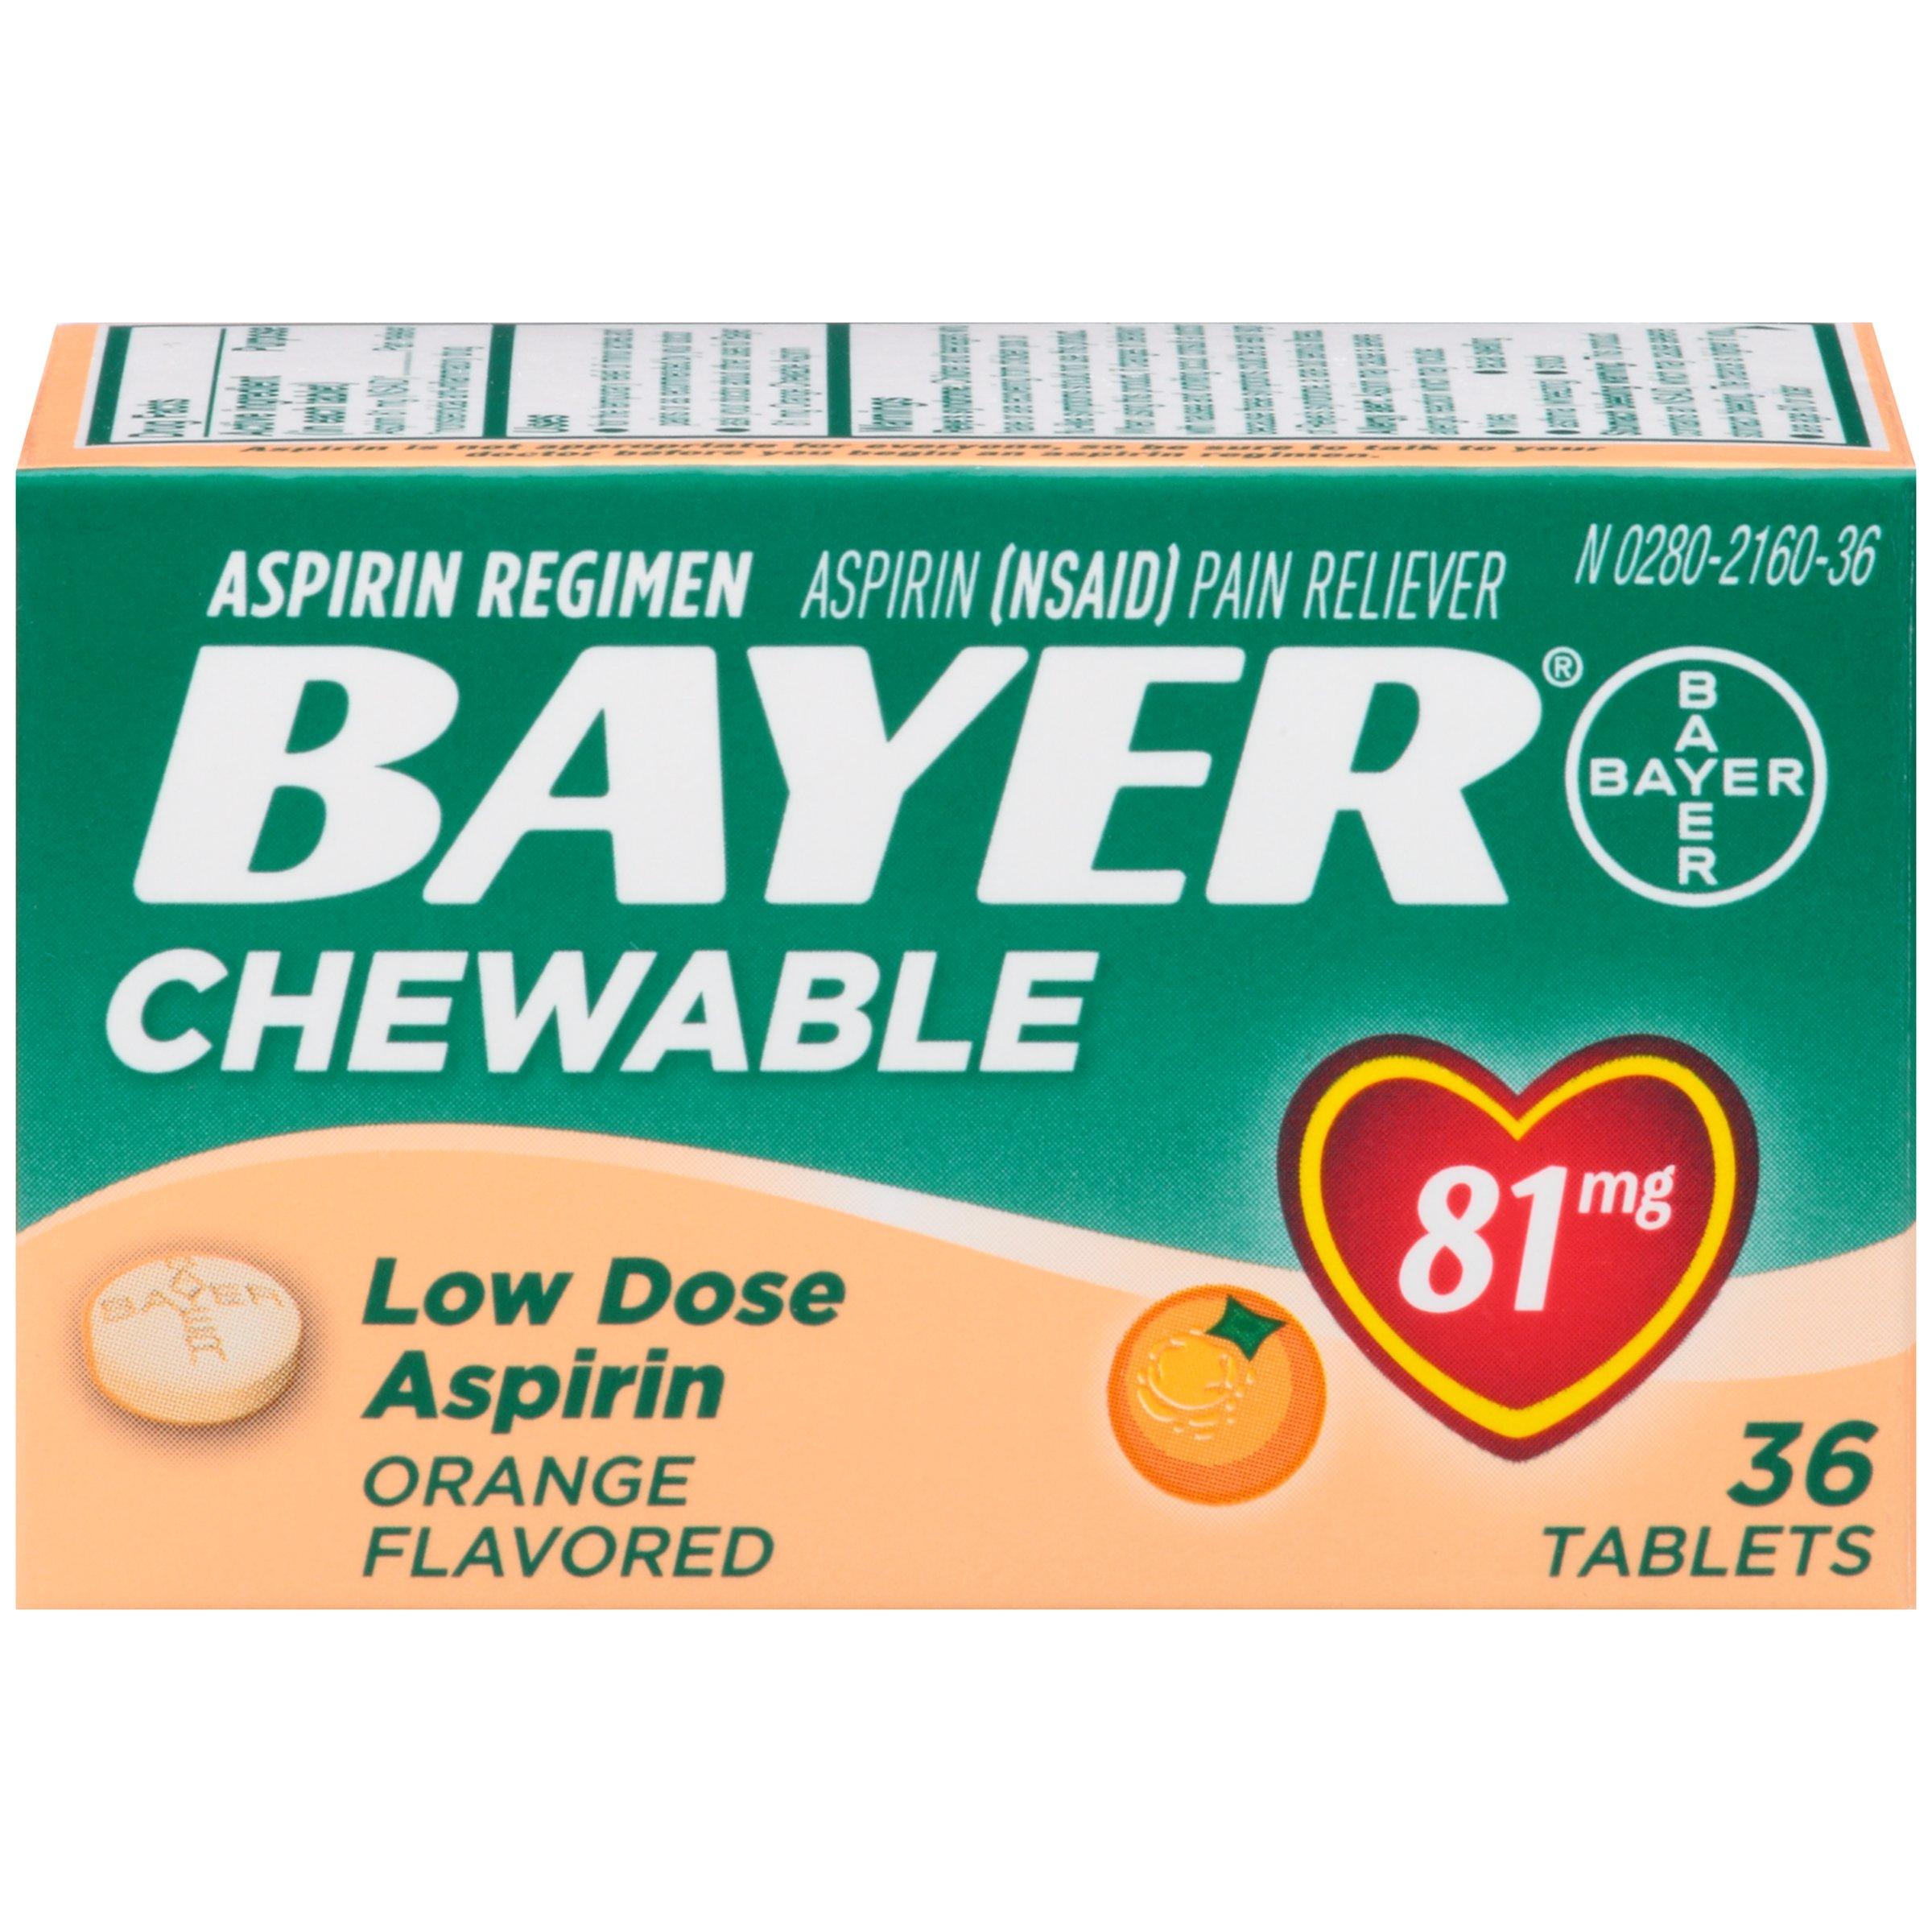 Aspirin Regimen Bayer, 81mg Chewable Tablets, Pain Reliever, Orange, 36 Count